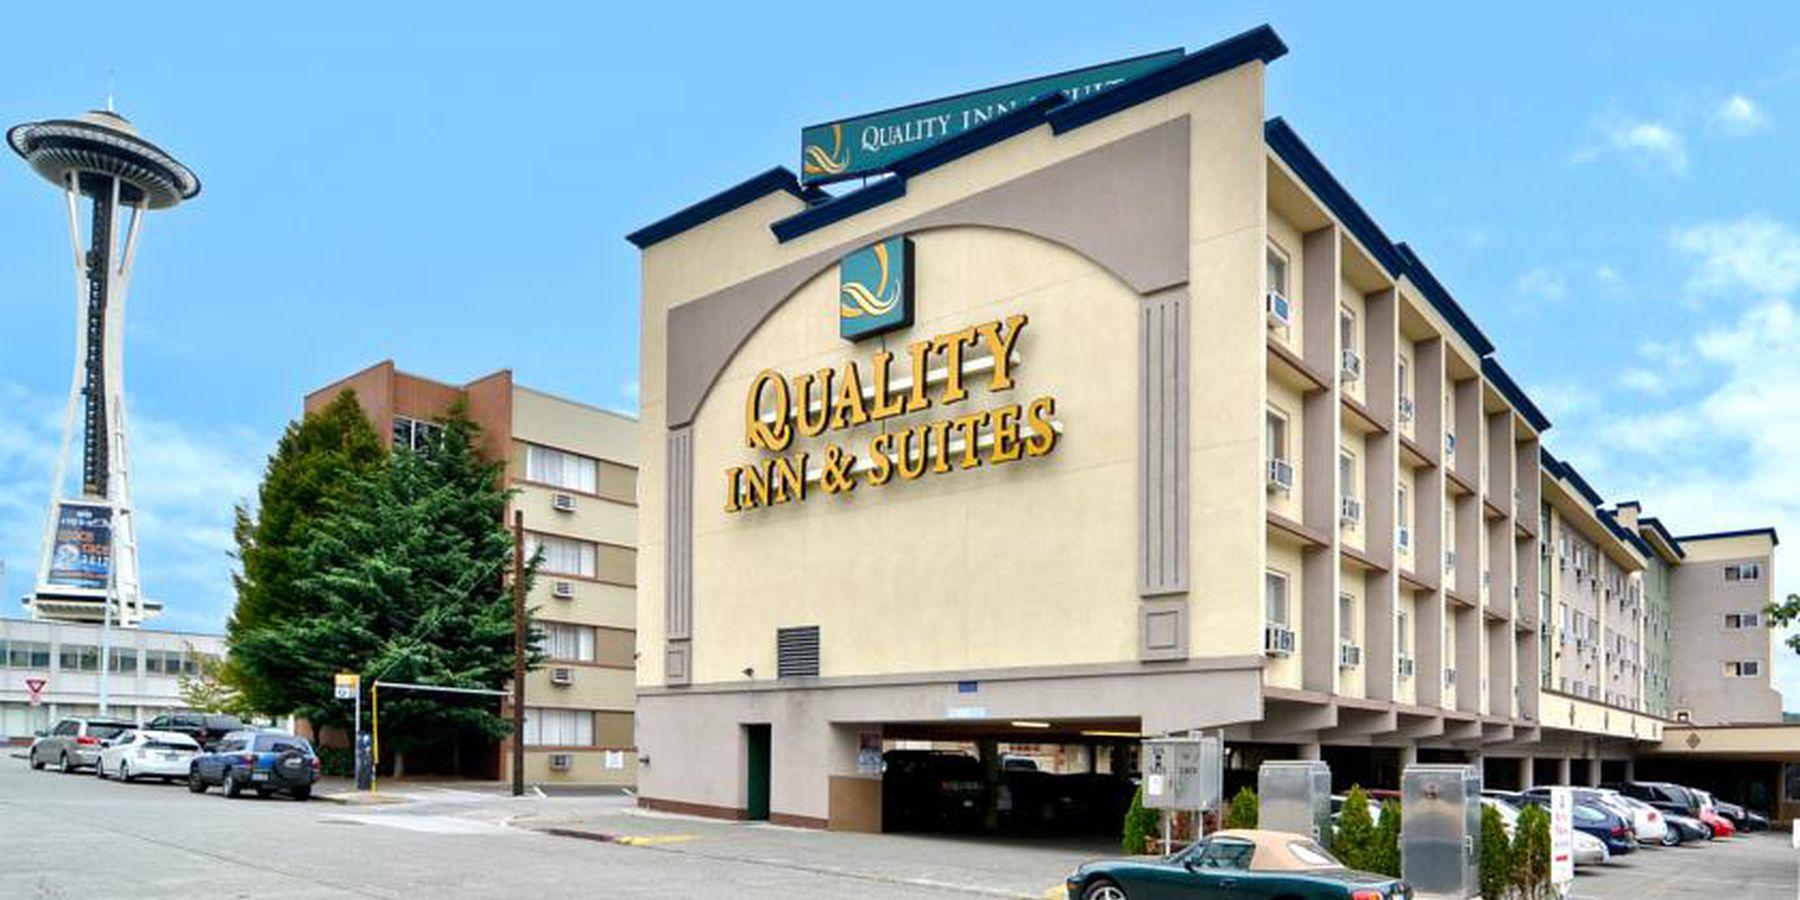 Quality Inn & Suites Seattle - exterior